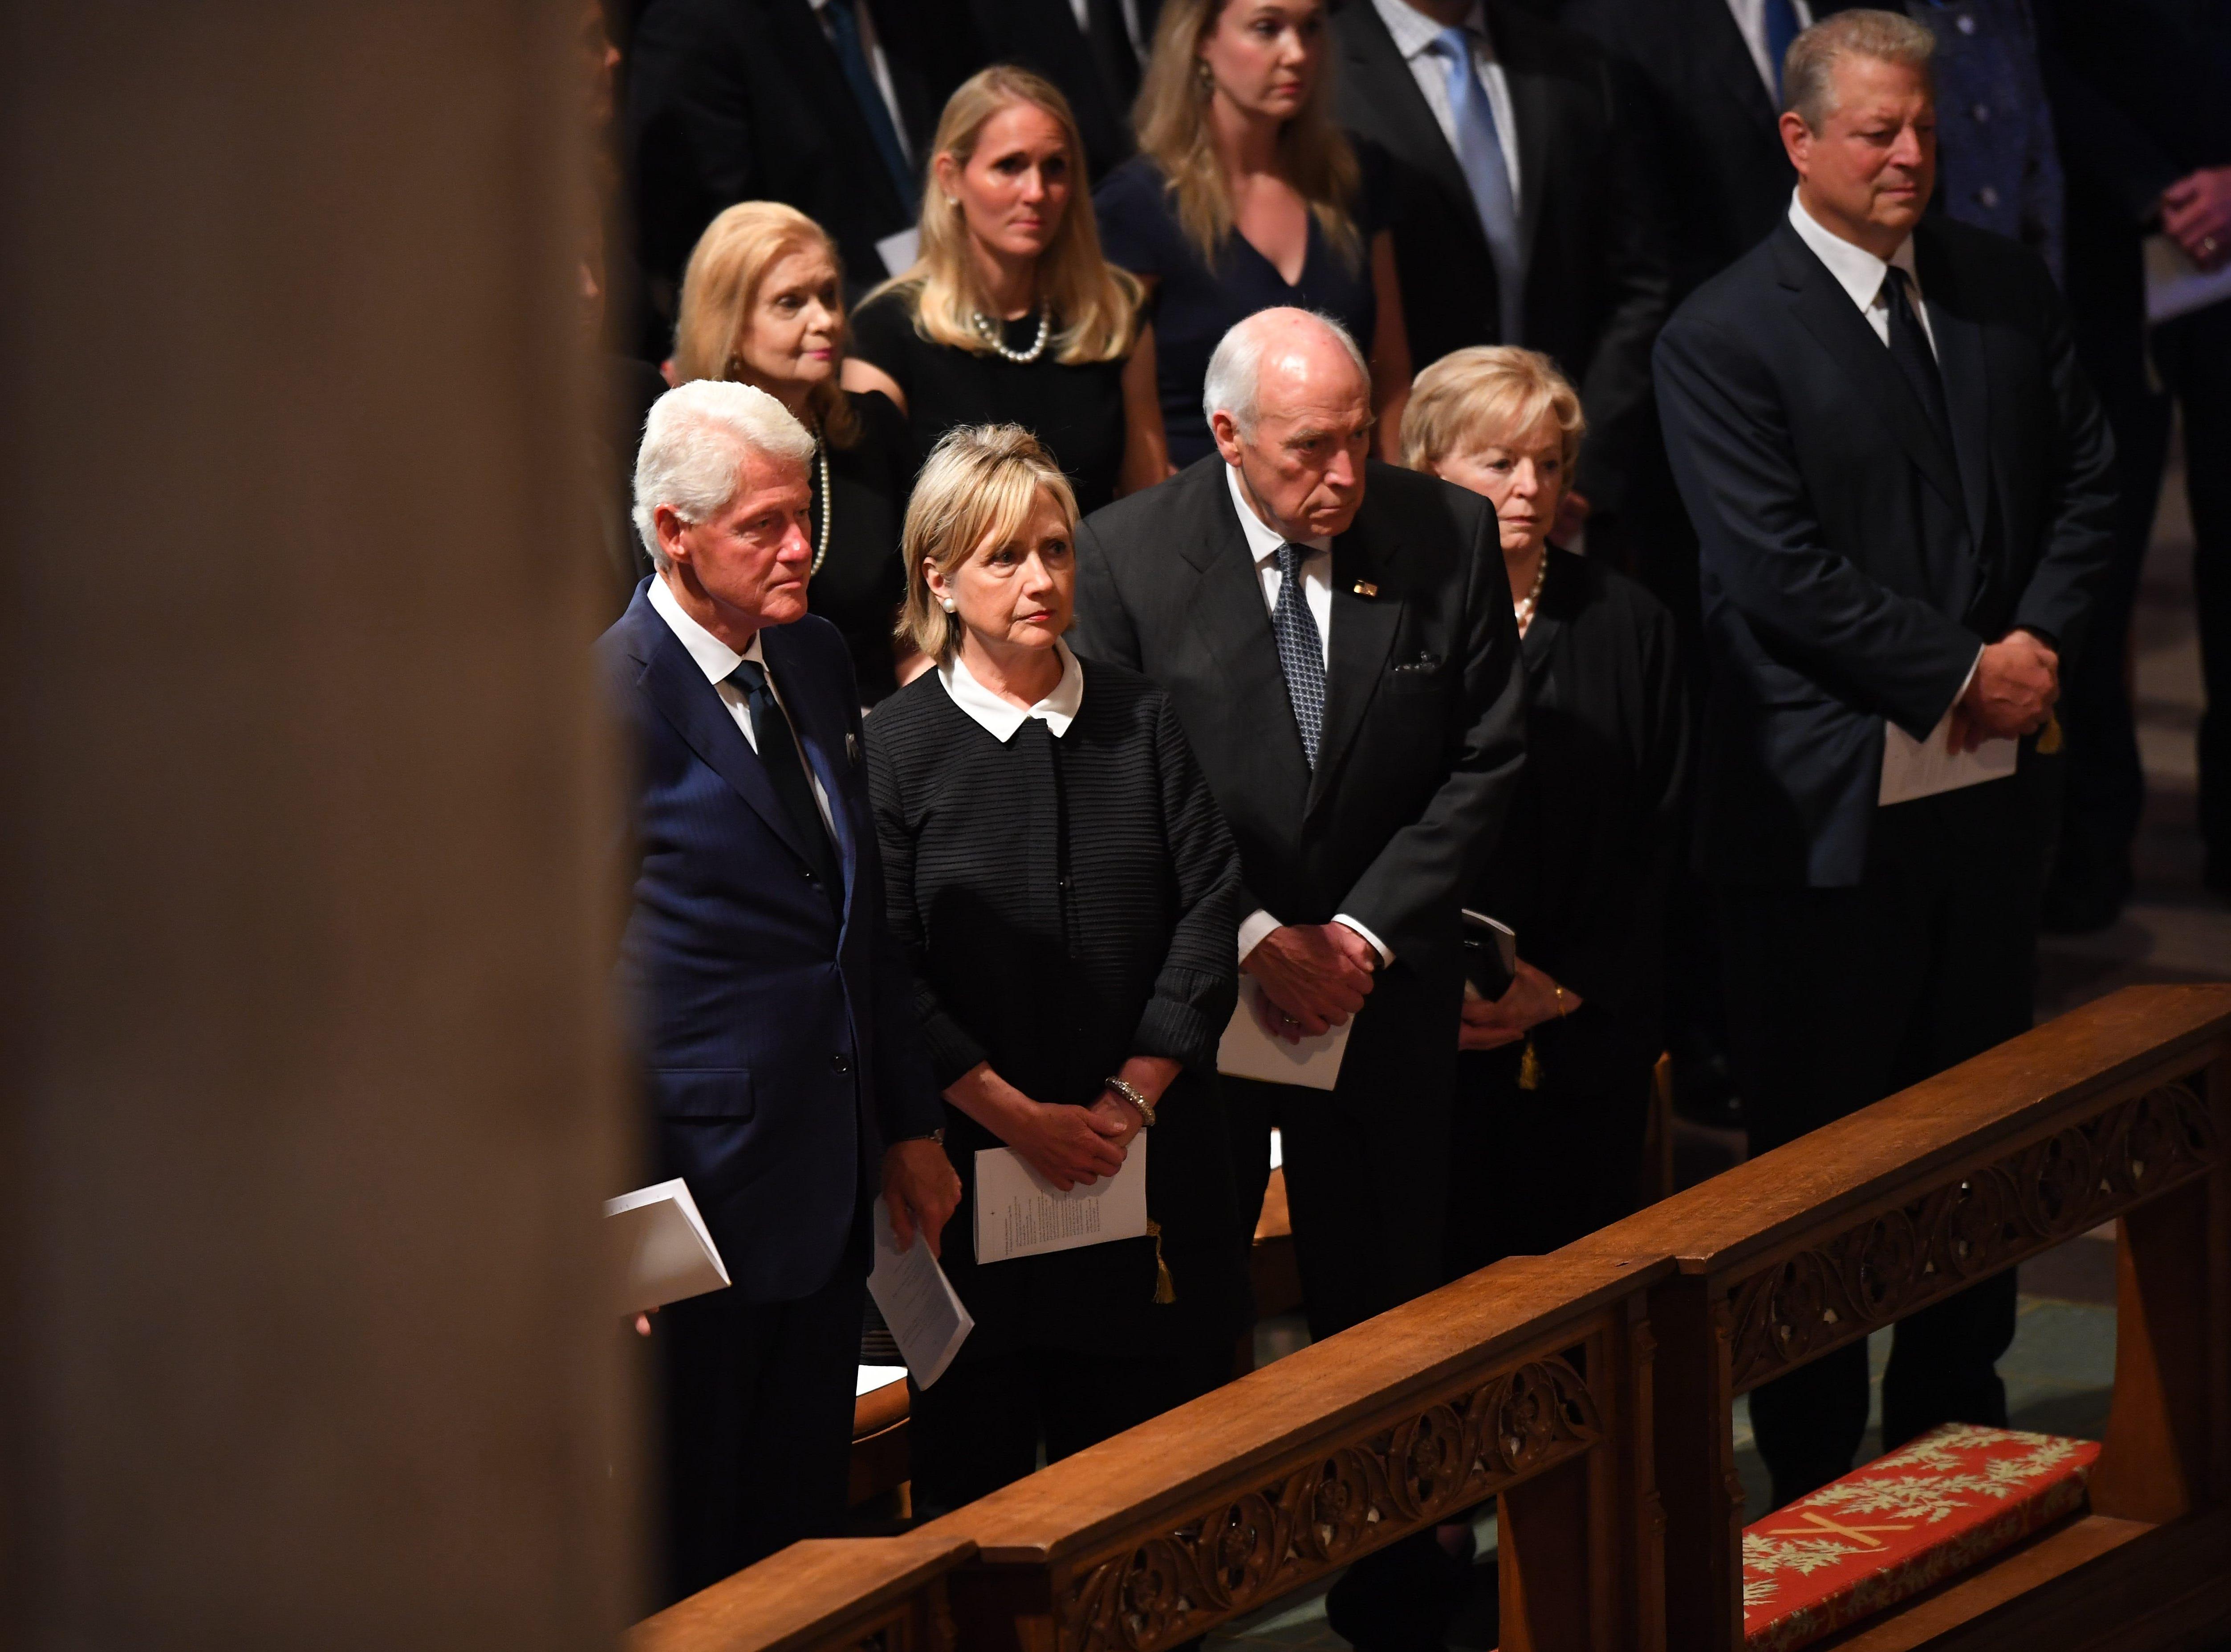 Former President Bill Clinton, left, former Secretary of State Hillary Clinton, former Vice President Dick Cheney, Lynne Cheney and former Vice President Al gore attend John McCain's memorial service on Sept. 1, 2018.